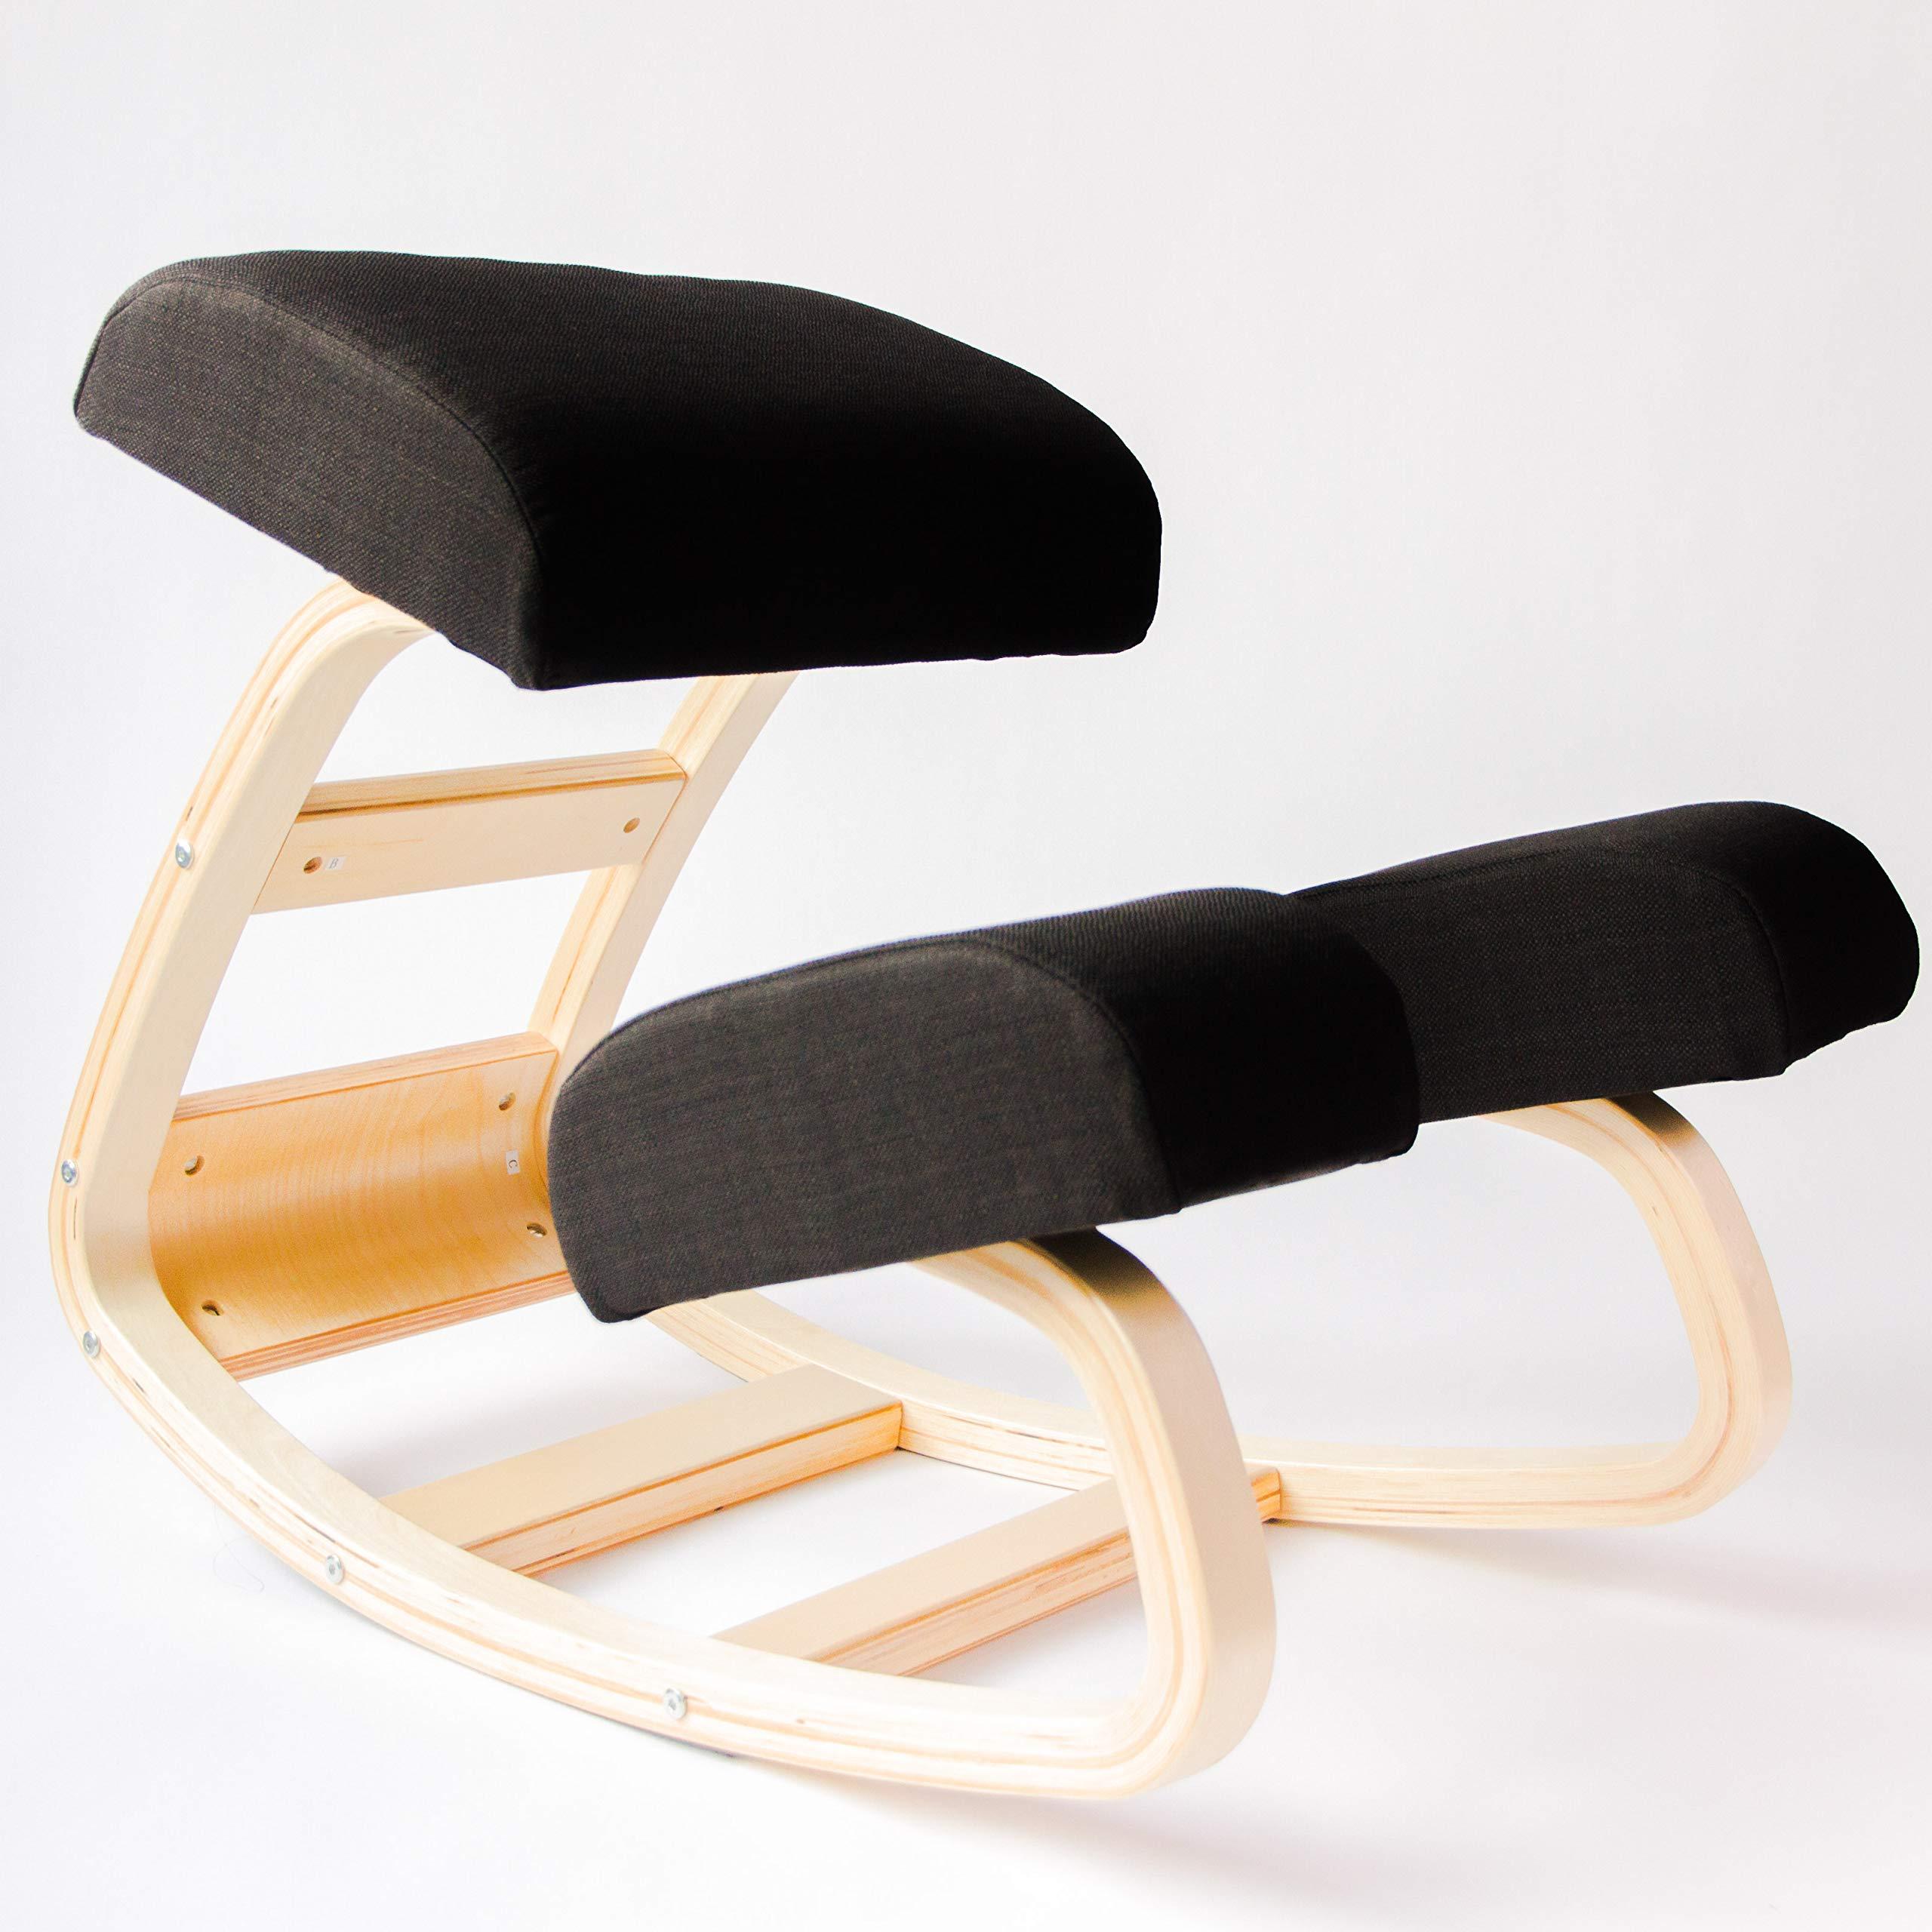 Swell Sleekform Austin Ergonomic Kneeling Chair Rocking Posture Correcting Wooden Stool For Office Home For Bad Backs Neck Pain Spine Tension Frankydiablos Diy Chair Ideas Frankydiabloscom